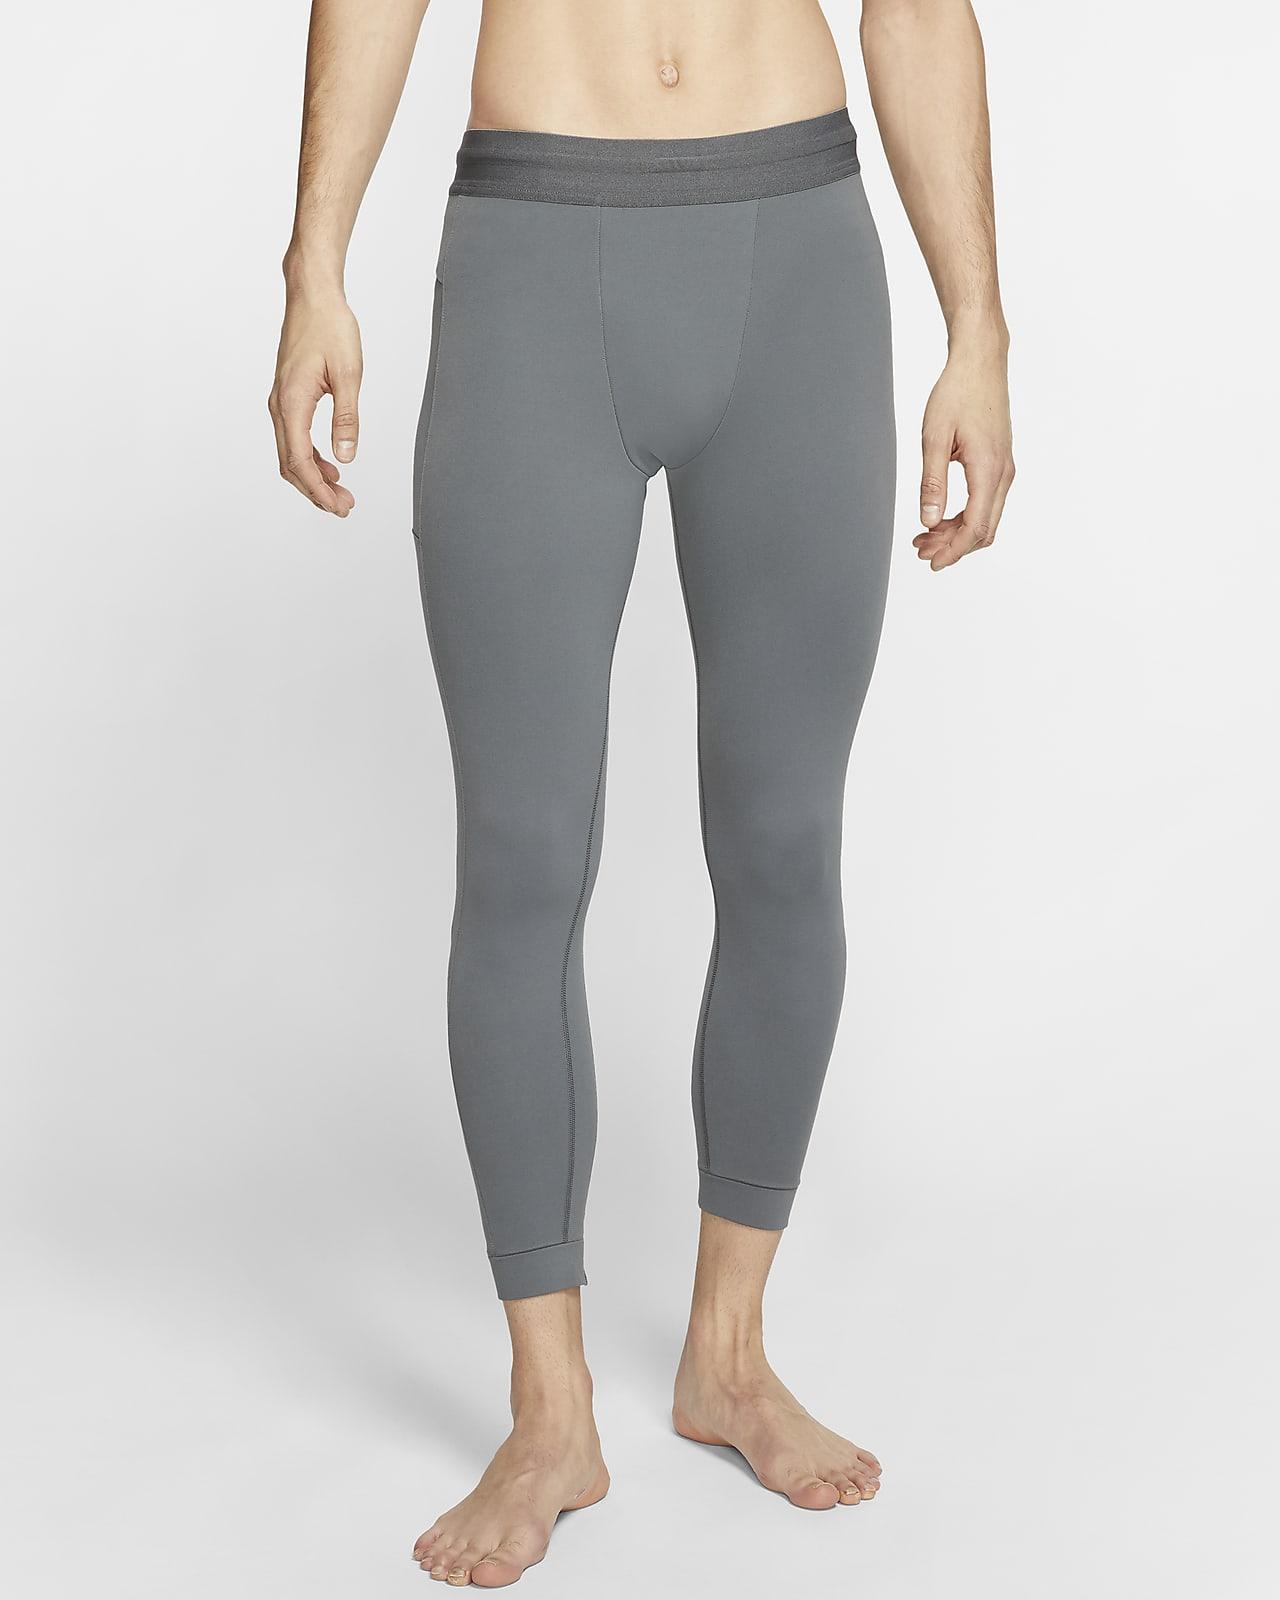 Mallas de Infinalon 3/4 para hombre Nike Yoga Dri-FIT